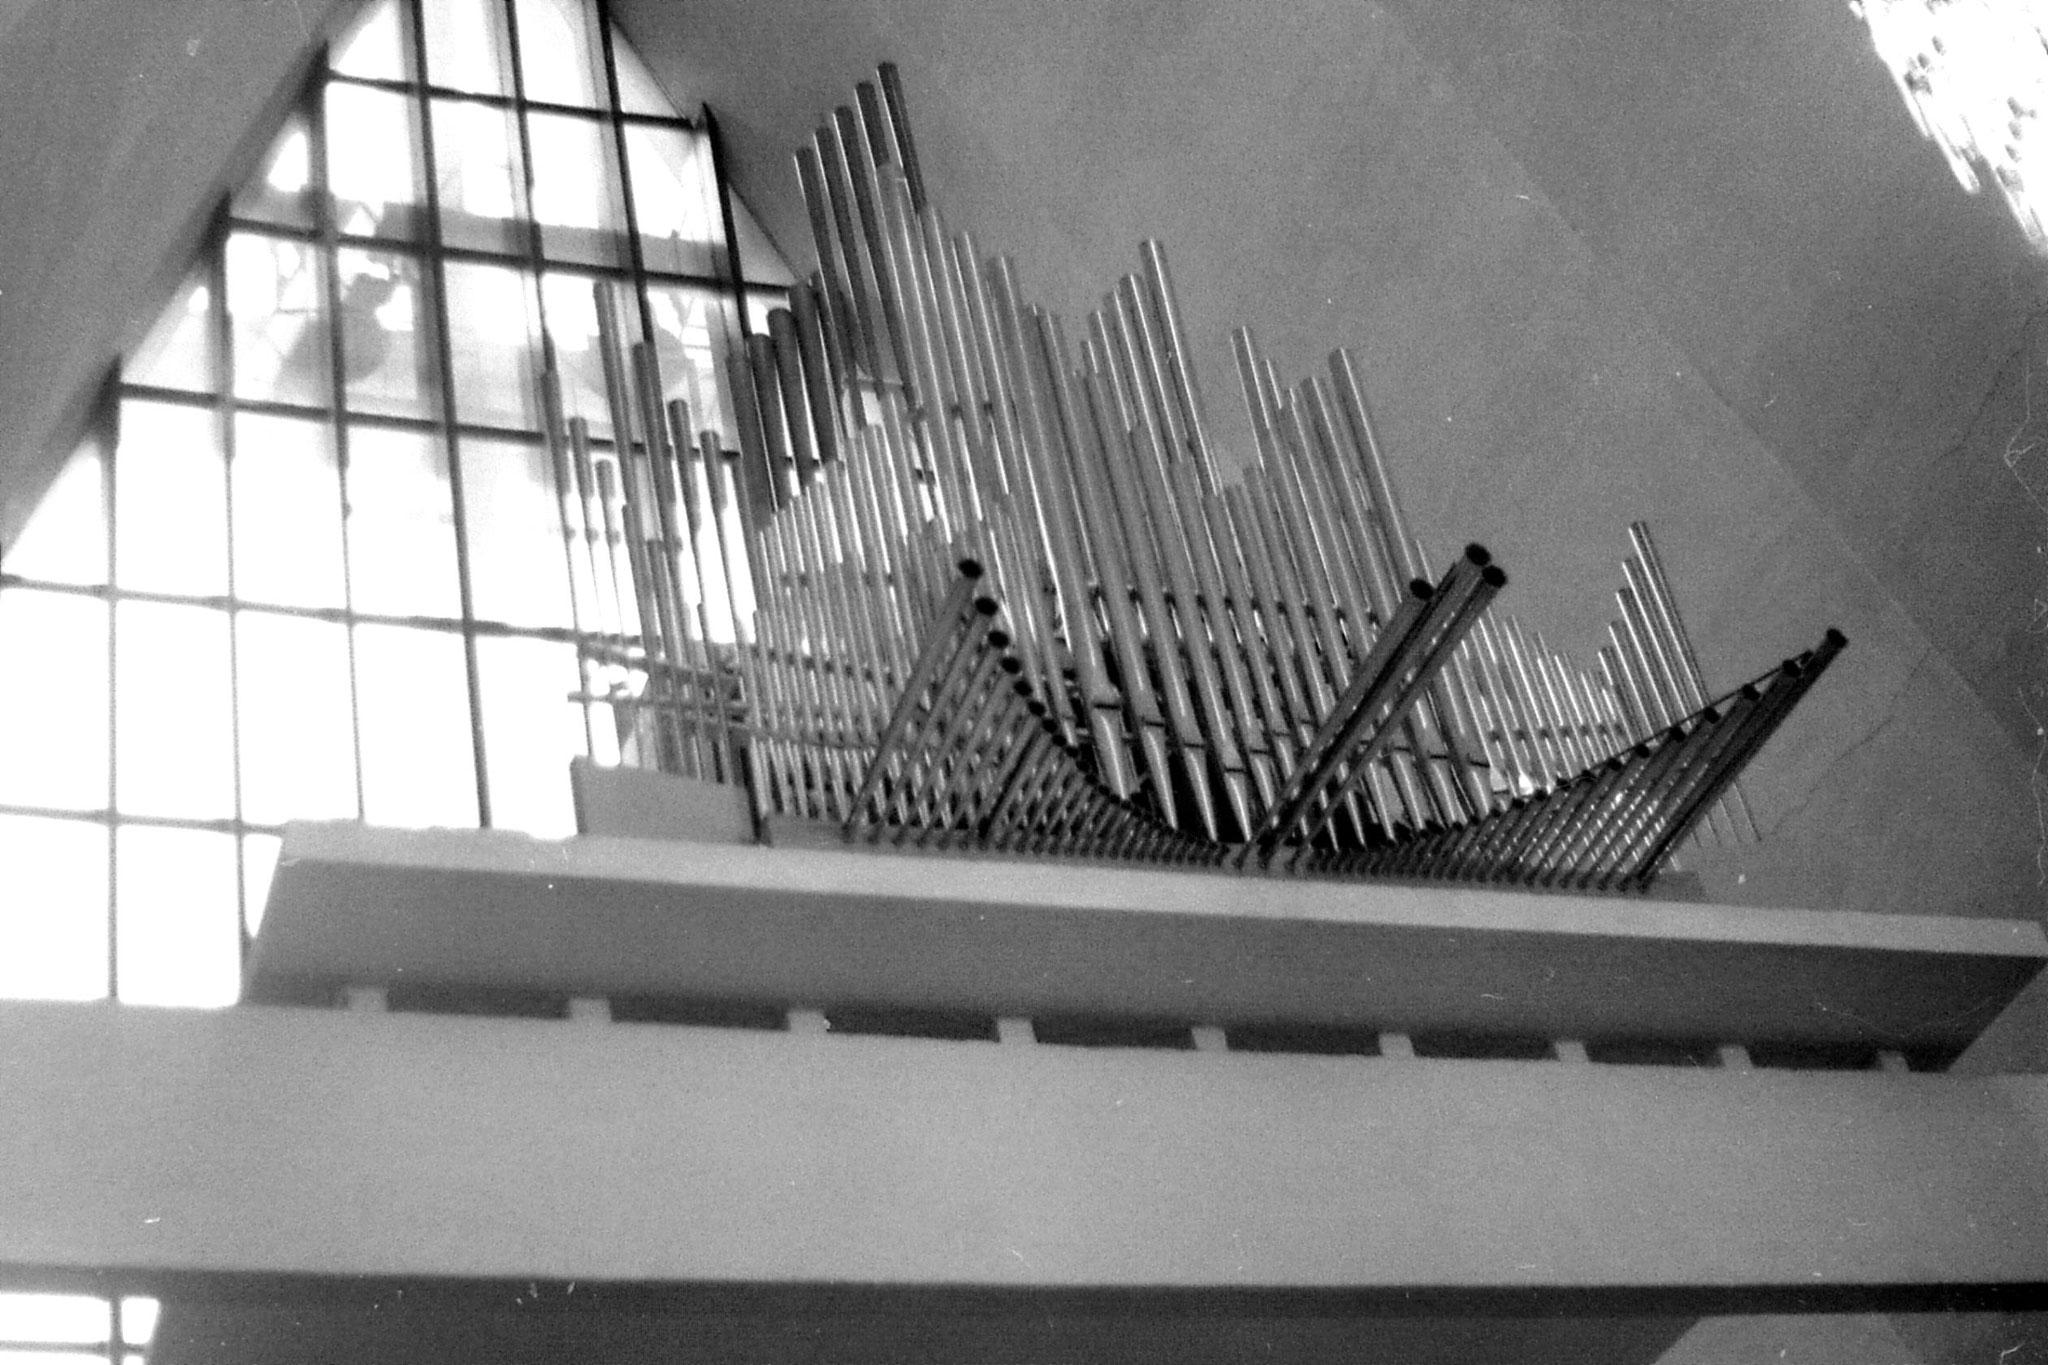 25/9/1988: 21: Tromsdal cathedral organ